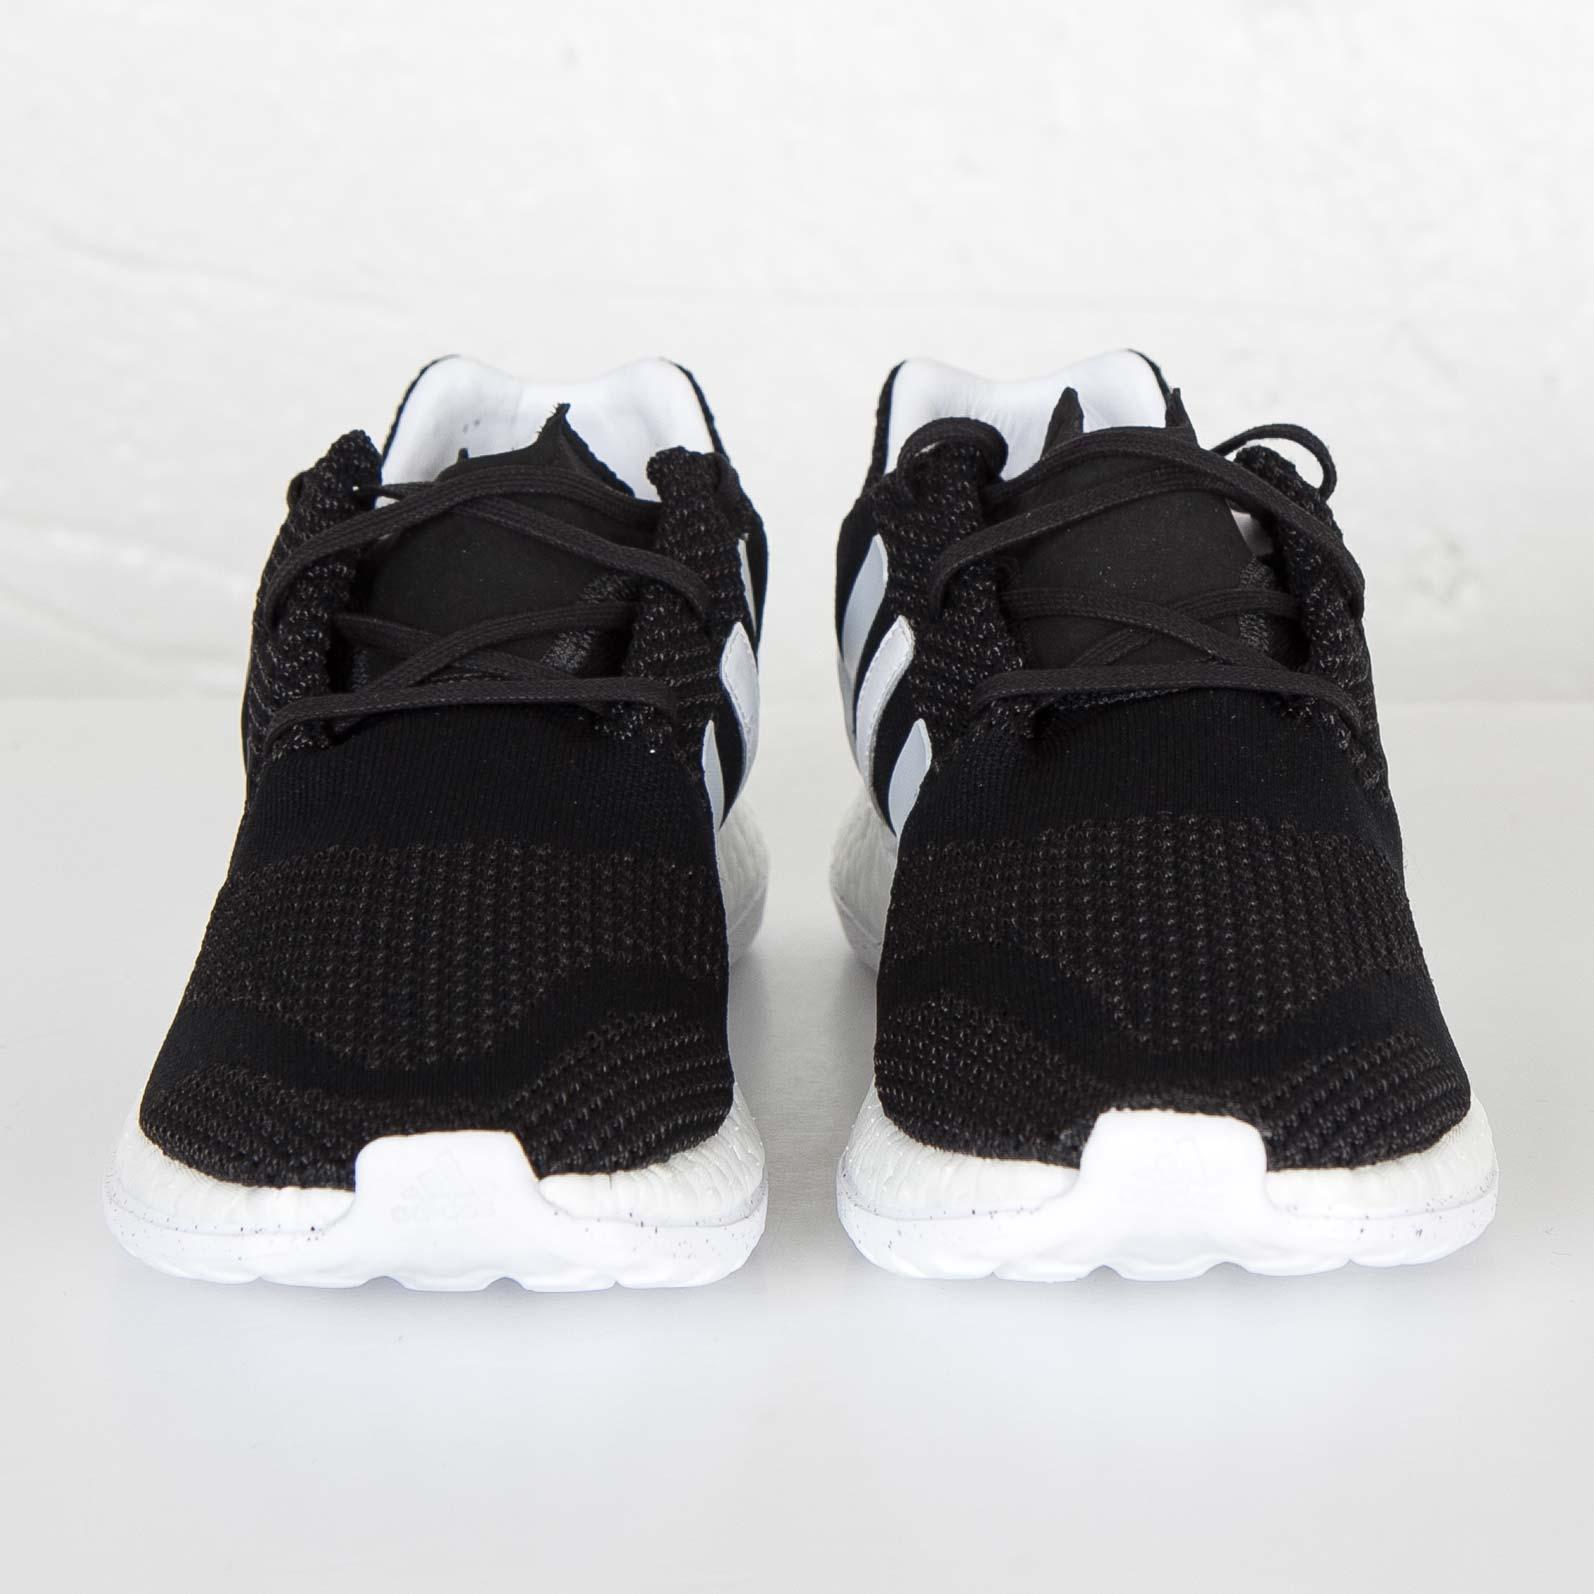 0a834864d adidas Y-3 Pure Boost ZG Knit - Aq5729 - Sneakersnstuff